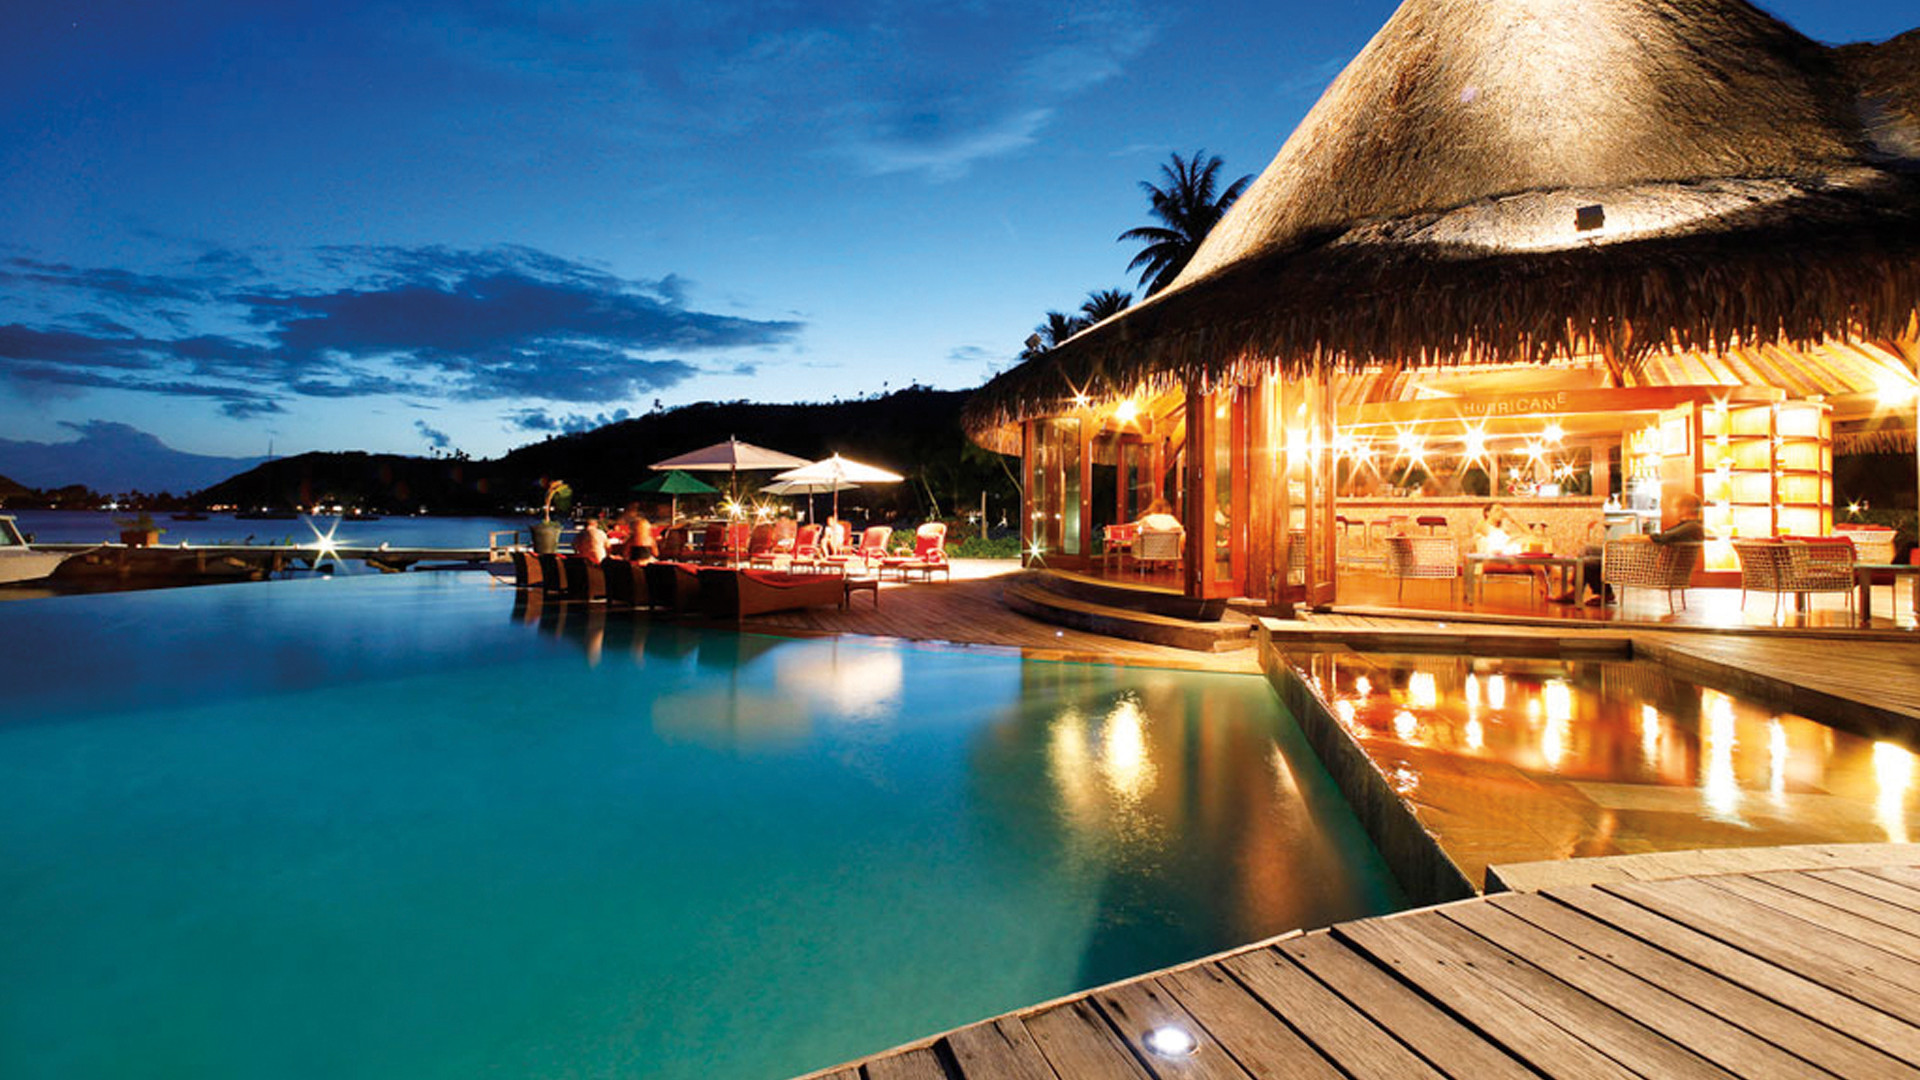 Res: 1920x1080, Sofitel Bora Bora Marara Beach Resort. | Grey Investment Group - Samoa's  most established family investment group